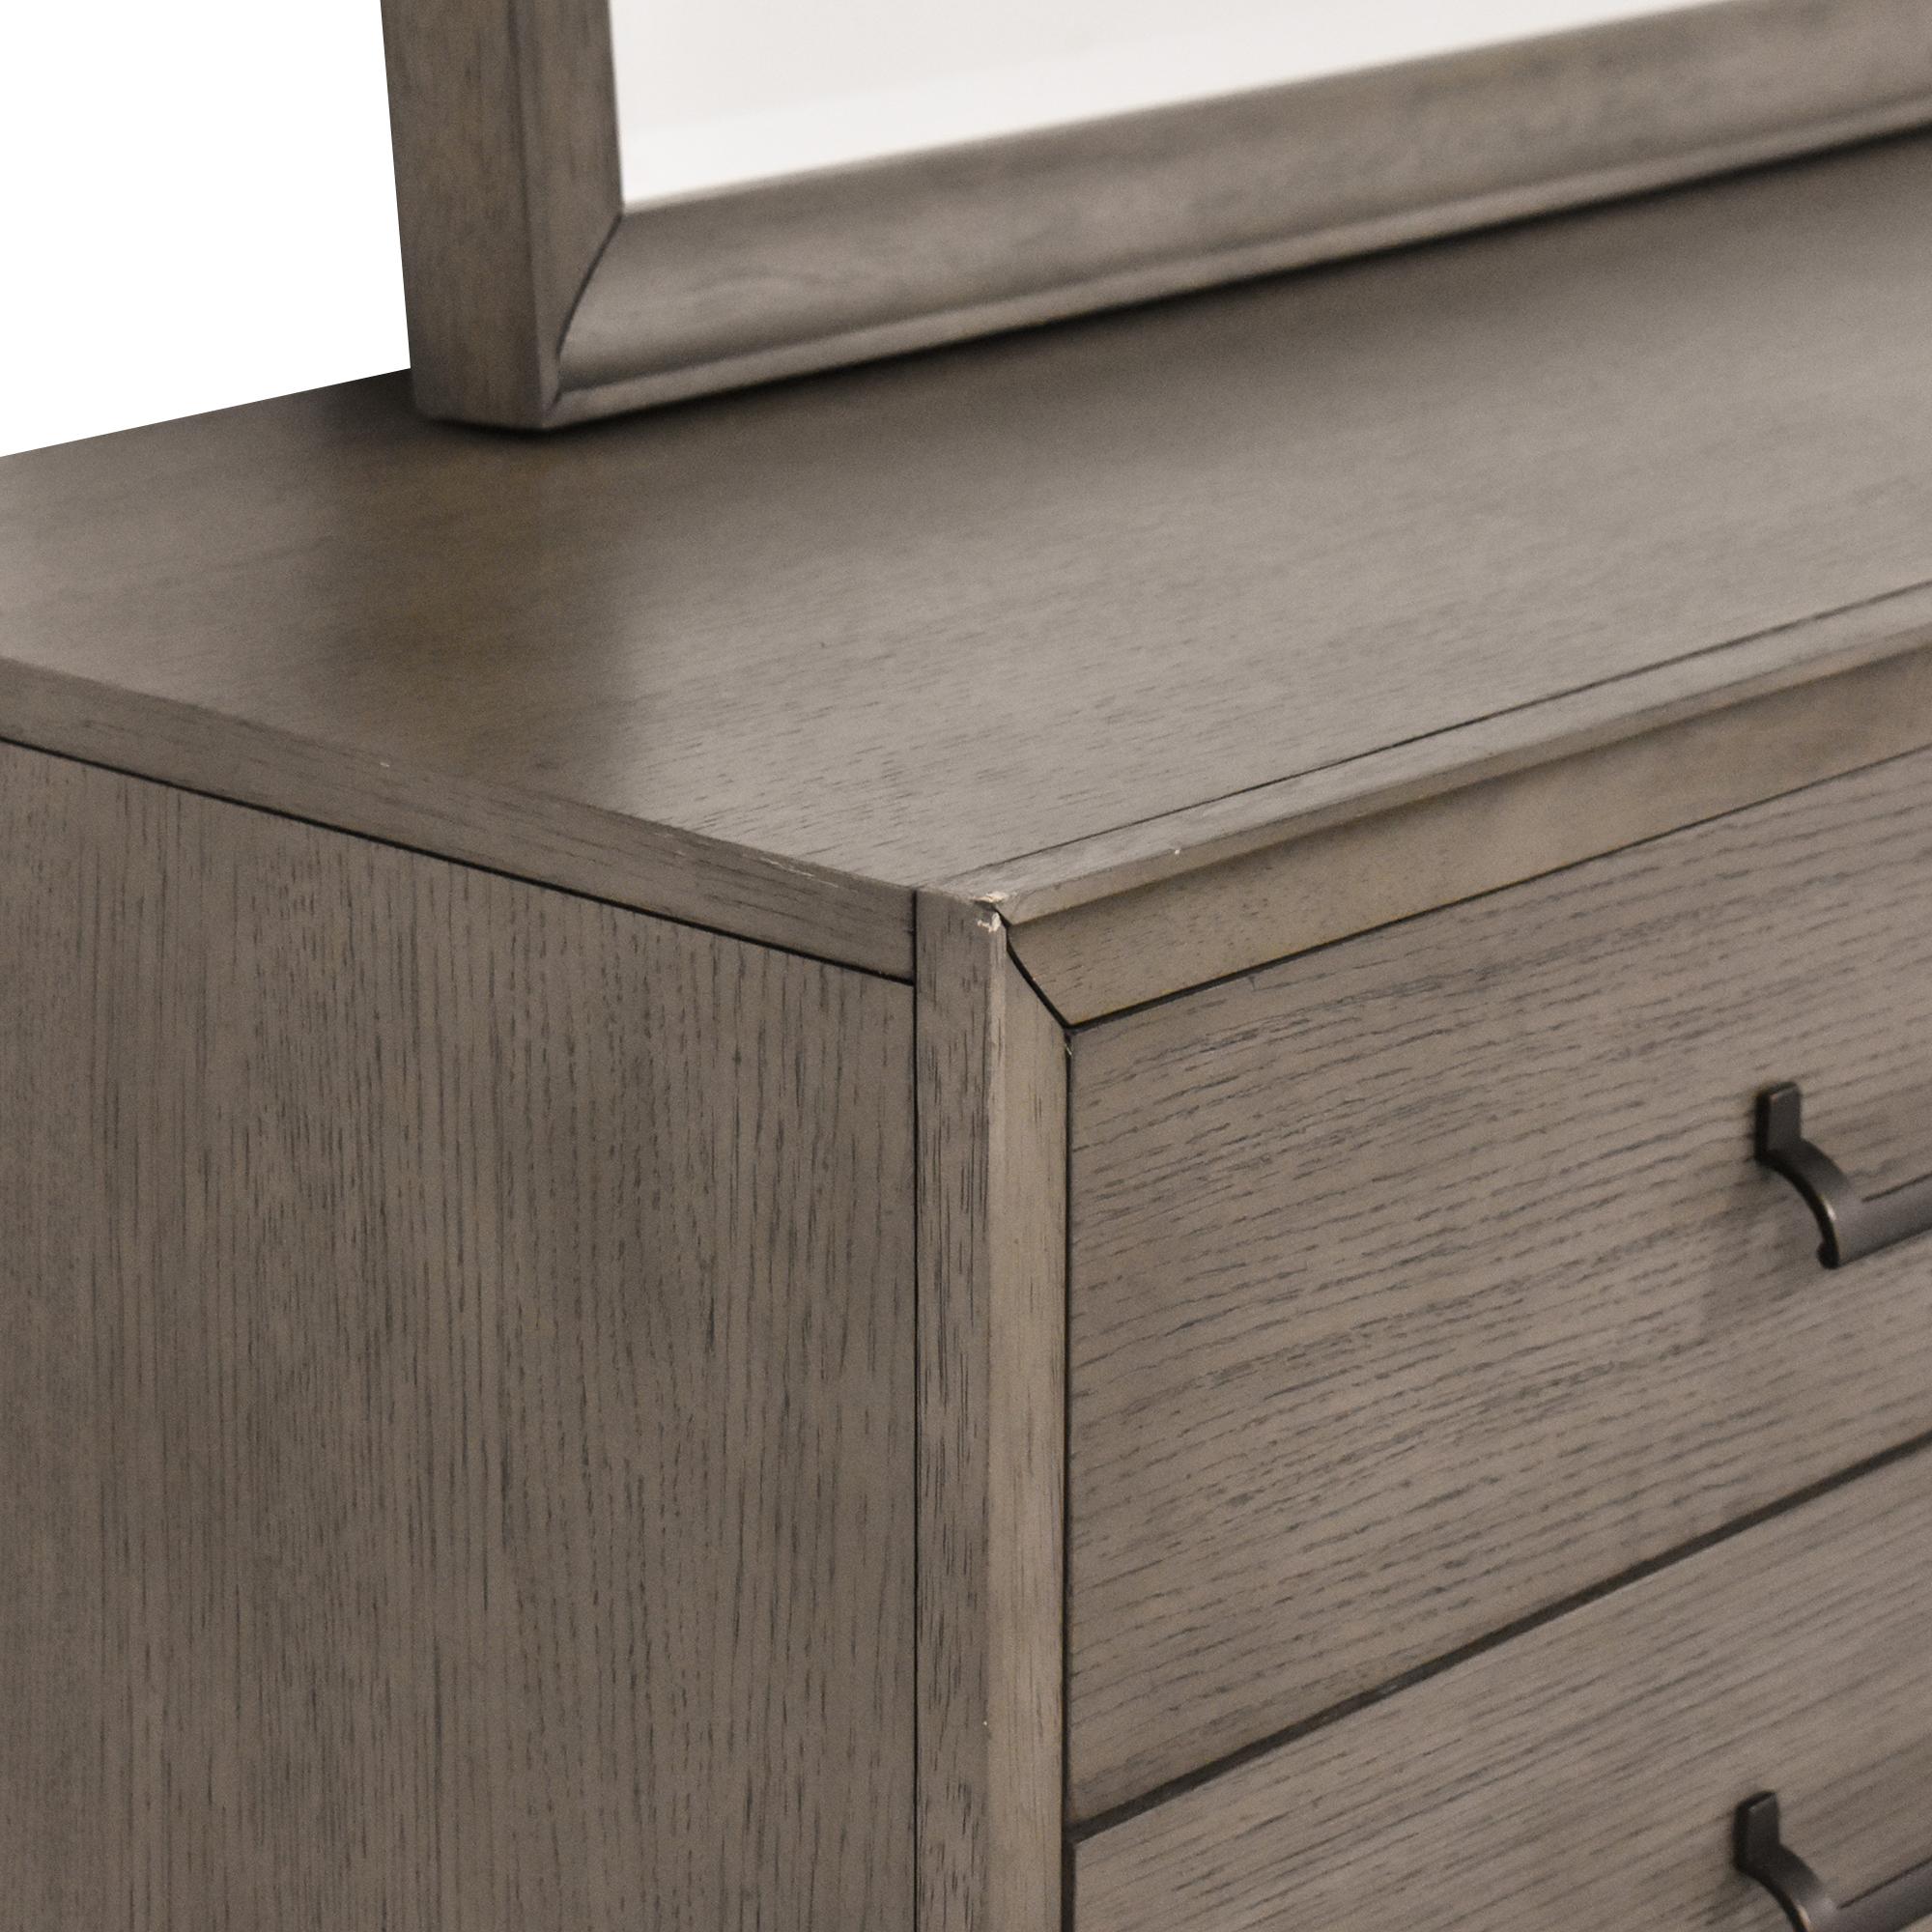 Casana Furniture Casana Double Dresser with Mirror price